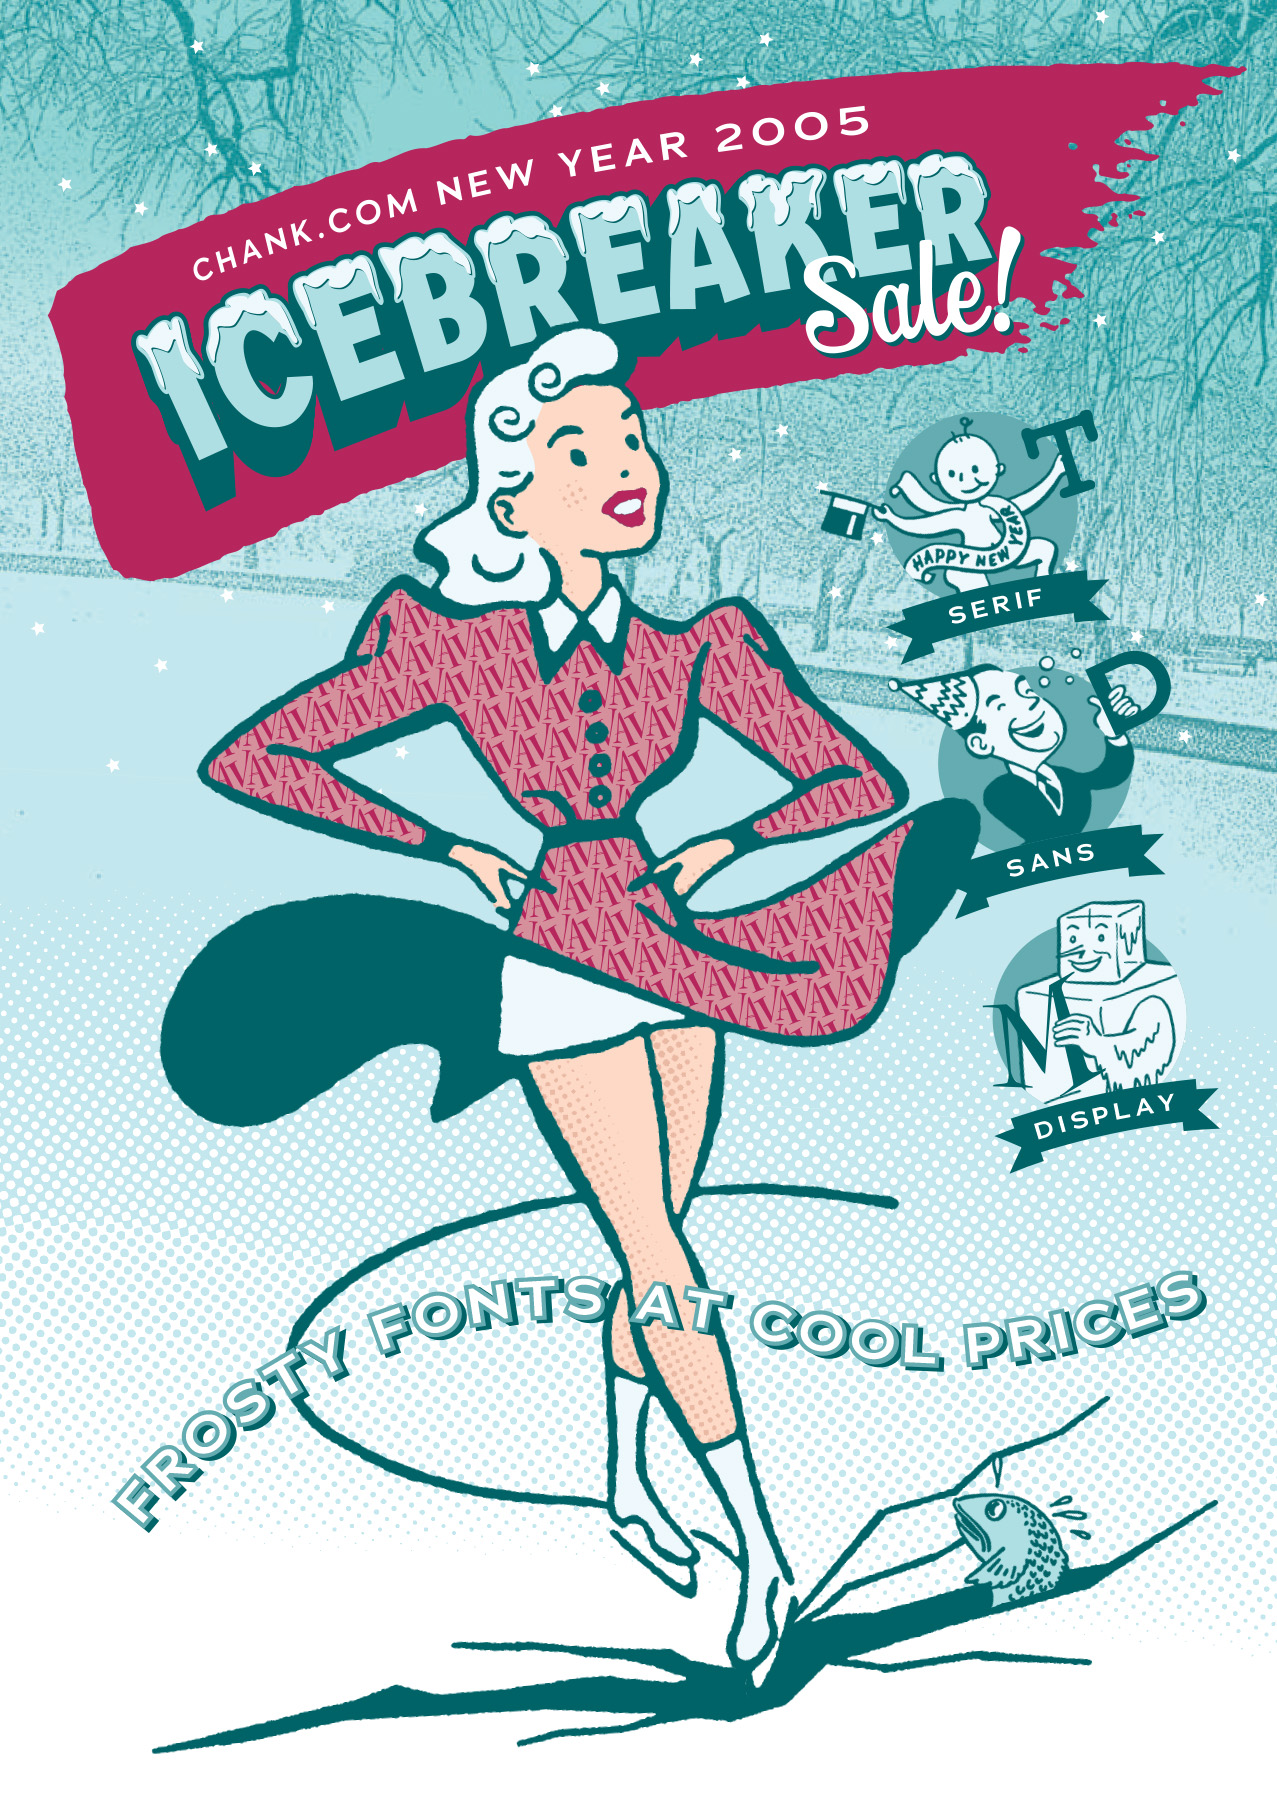 Chank.com Icebreaker postcard